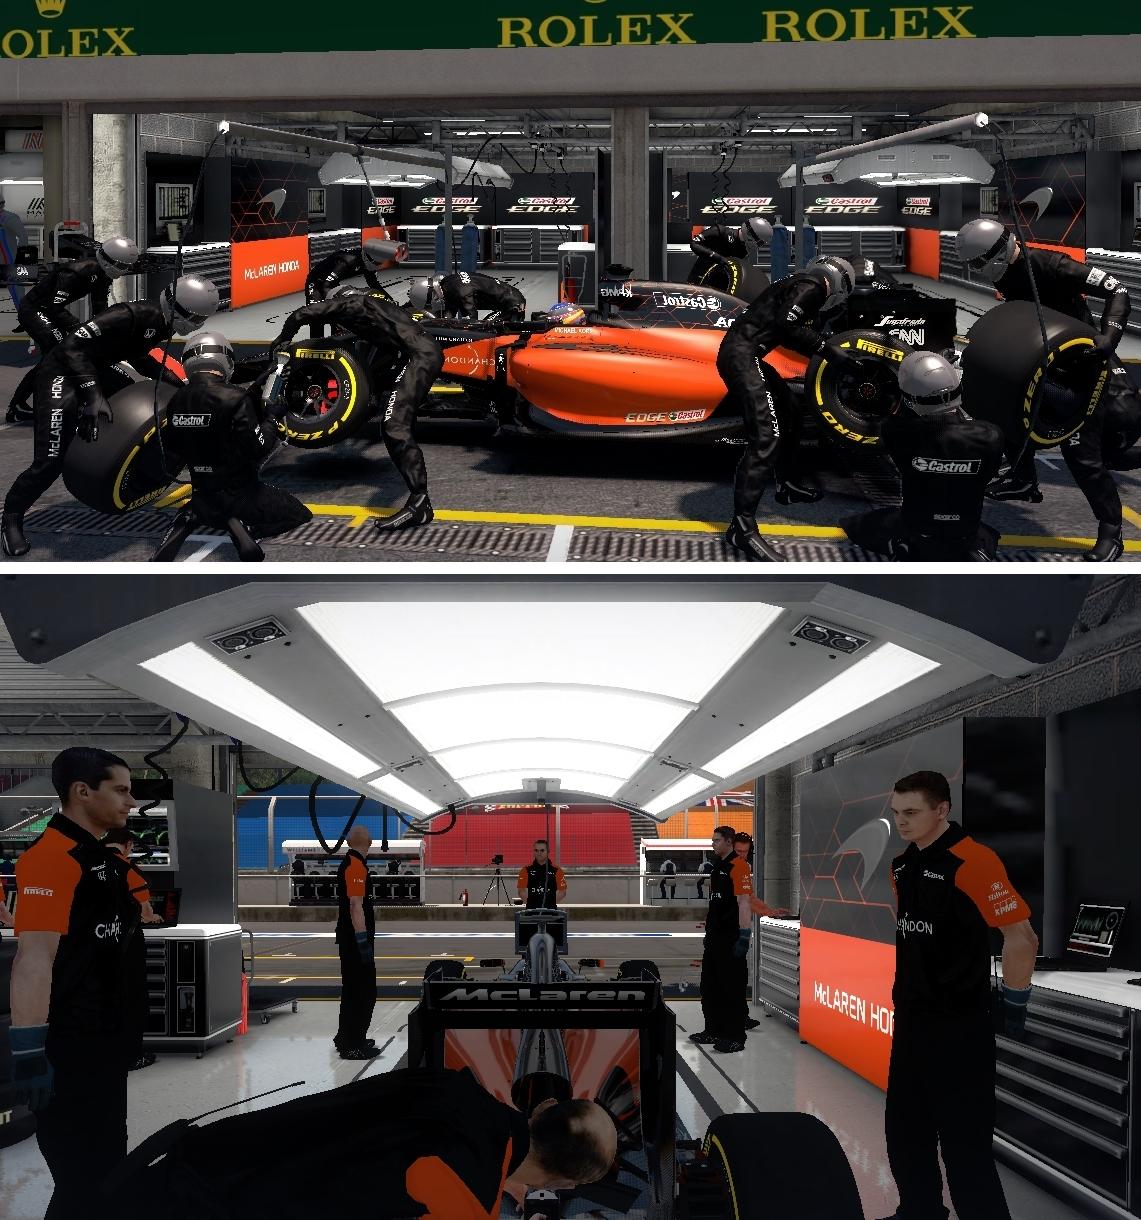 Sean Bull Mclaren Garage Crew.jpg